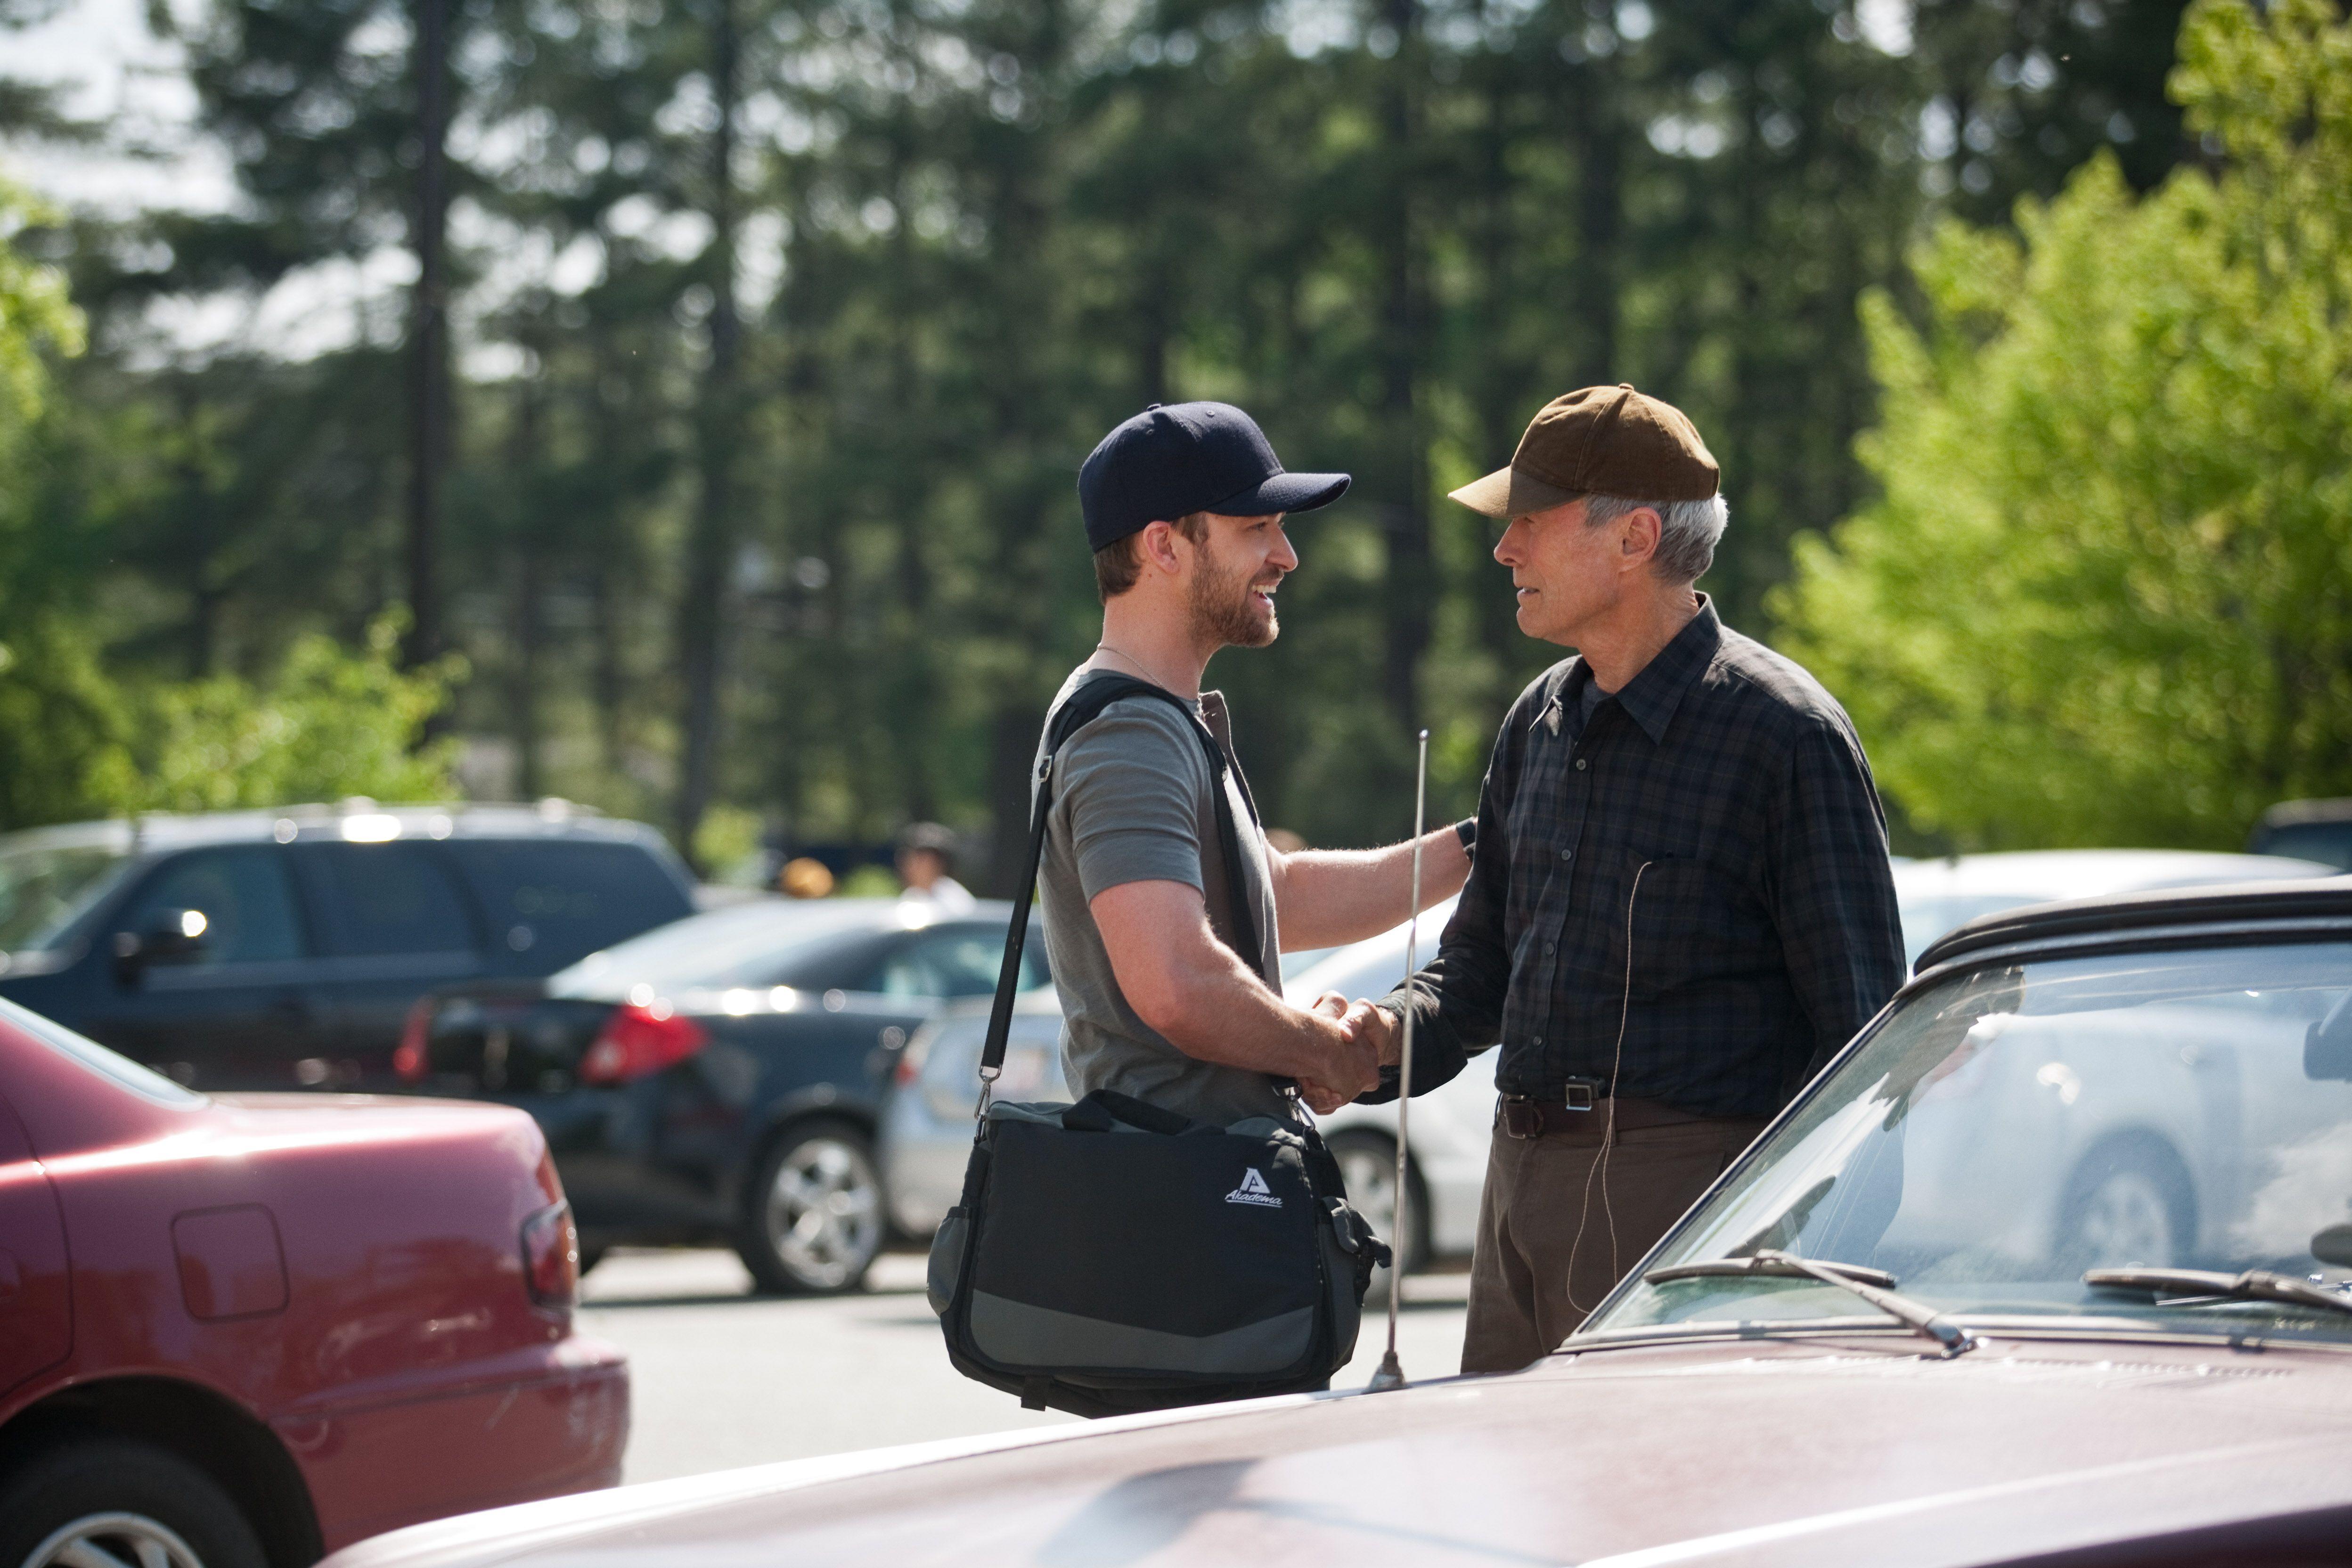 ¿Cuánto mide Justin Timberlake? - Altura - Real height B6acaa9c4b74dc9c8a4bfb315677c640